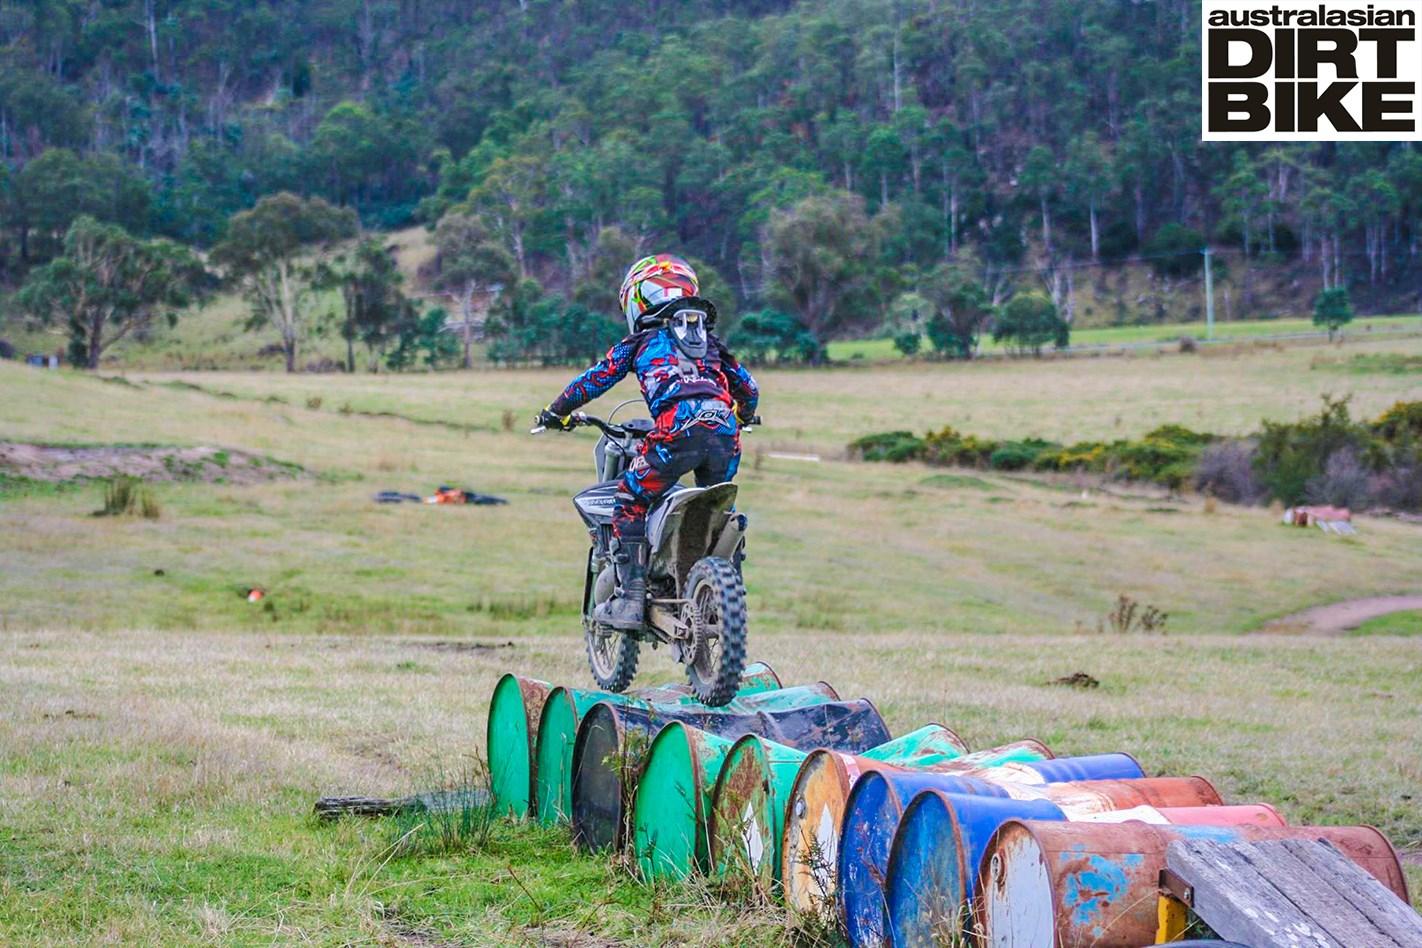 Southern Junior Dirt Bike Club Tas Australasian Dirt Bike Magazine